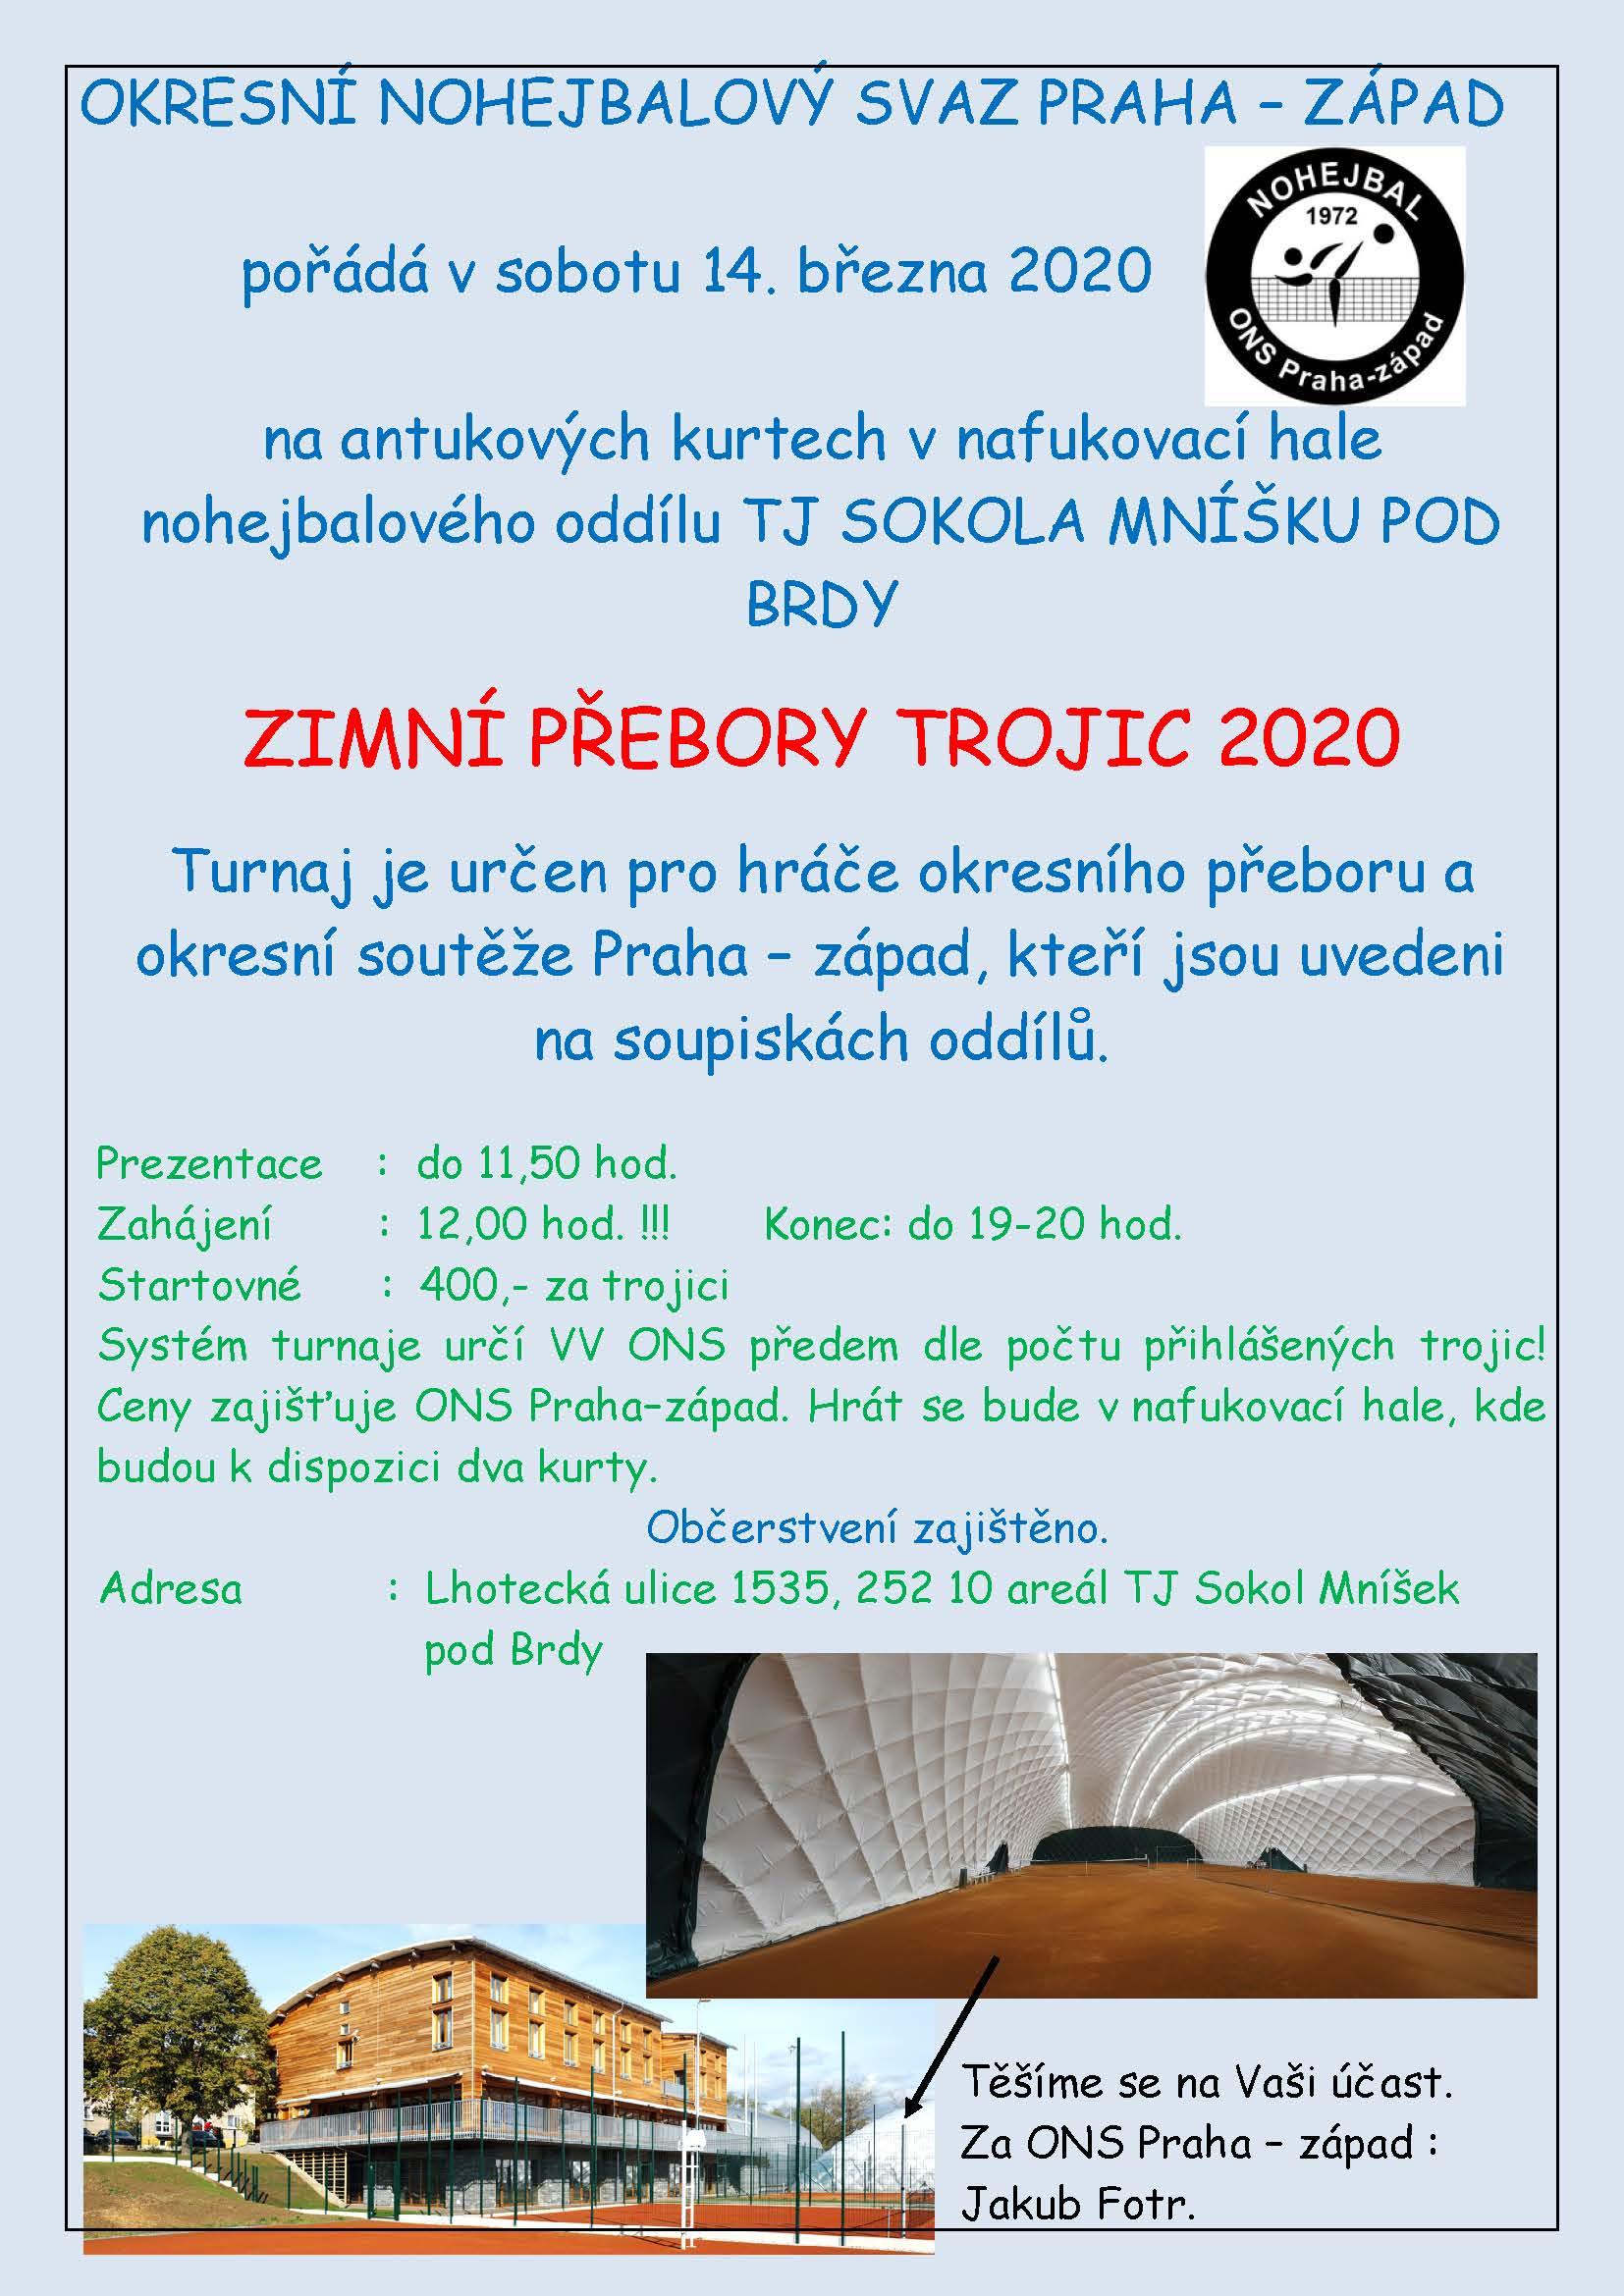 pozvanka-zimni-pohar-trojic-2020.jpg